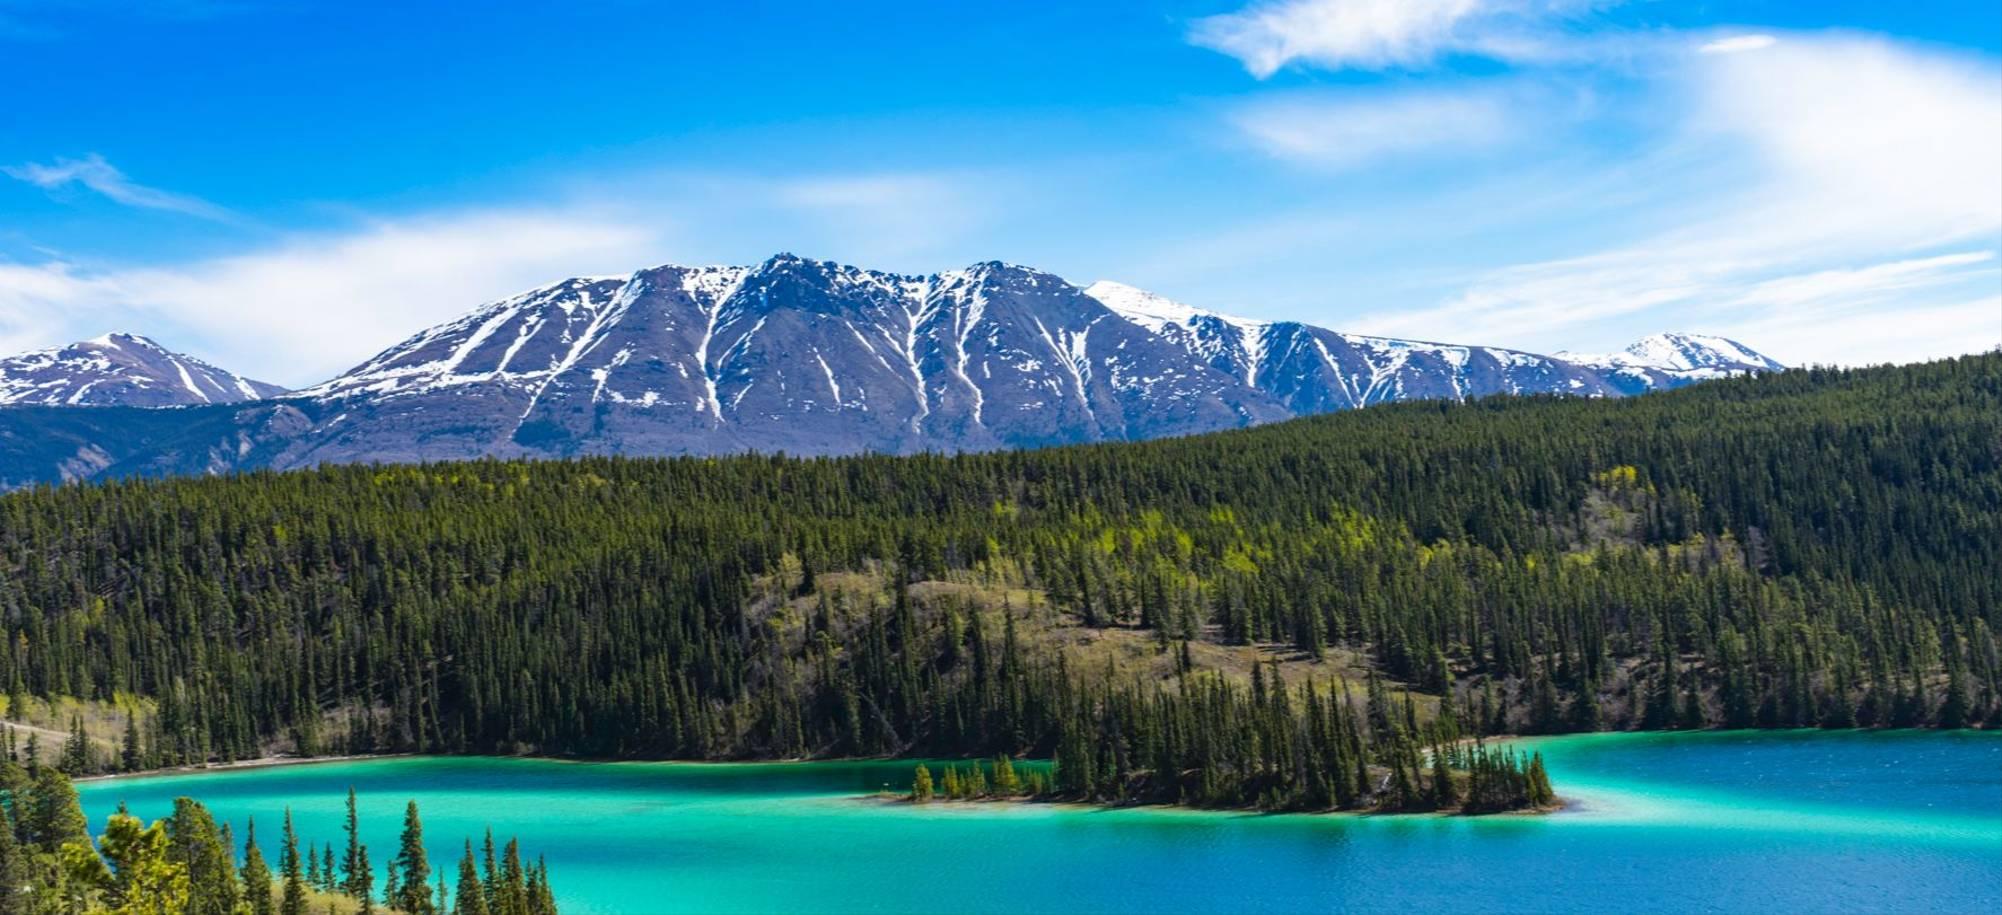 Skagway   Breathtaking Views Across The Lake   Itinerary Desktop